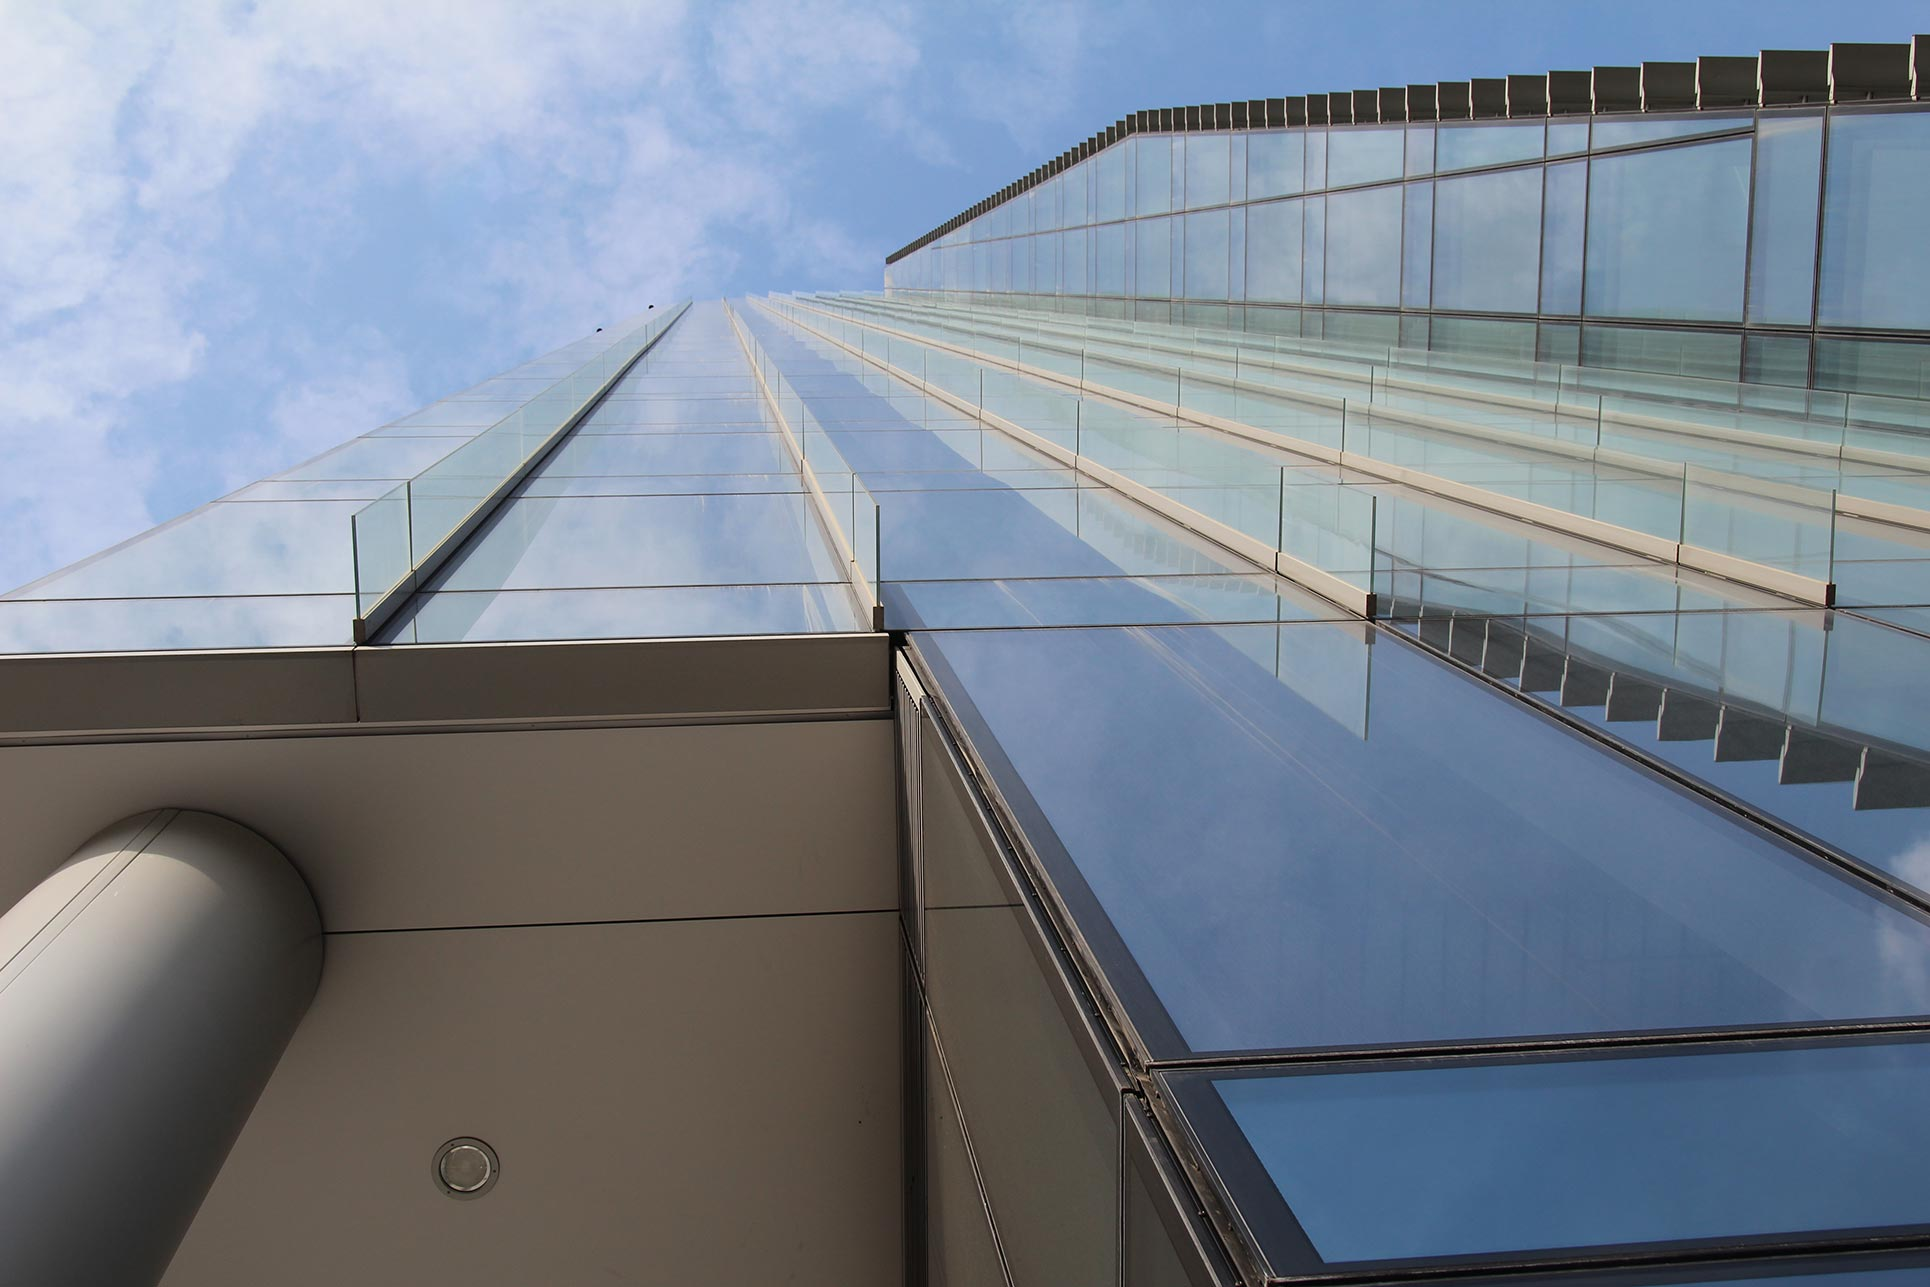 Il Diamantone, 2012, Kohn Pedersen & Fox, New York (Photo: Barbara Fässler)